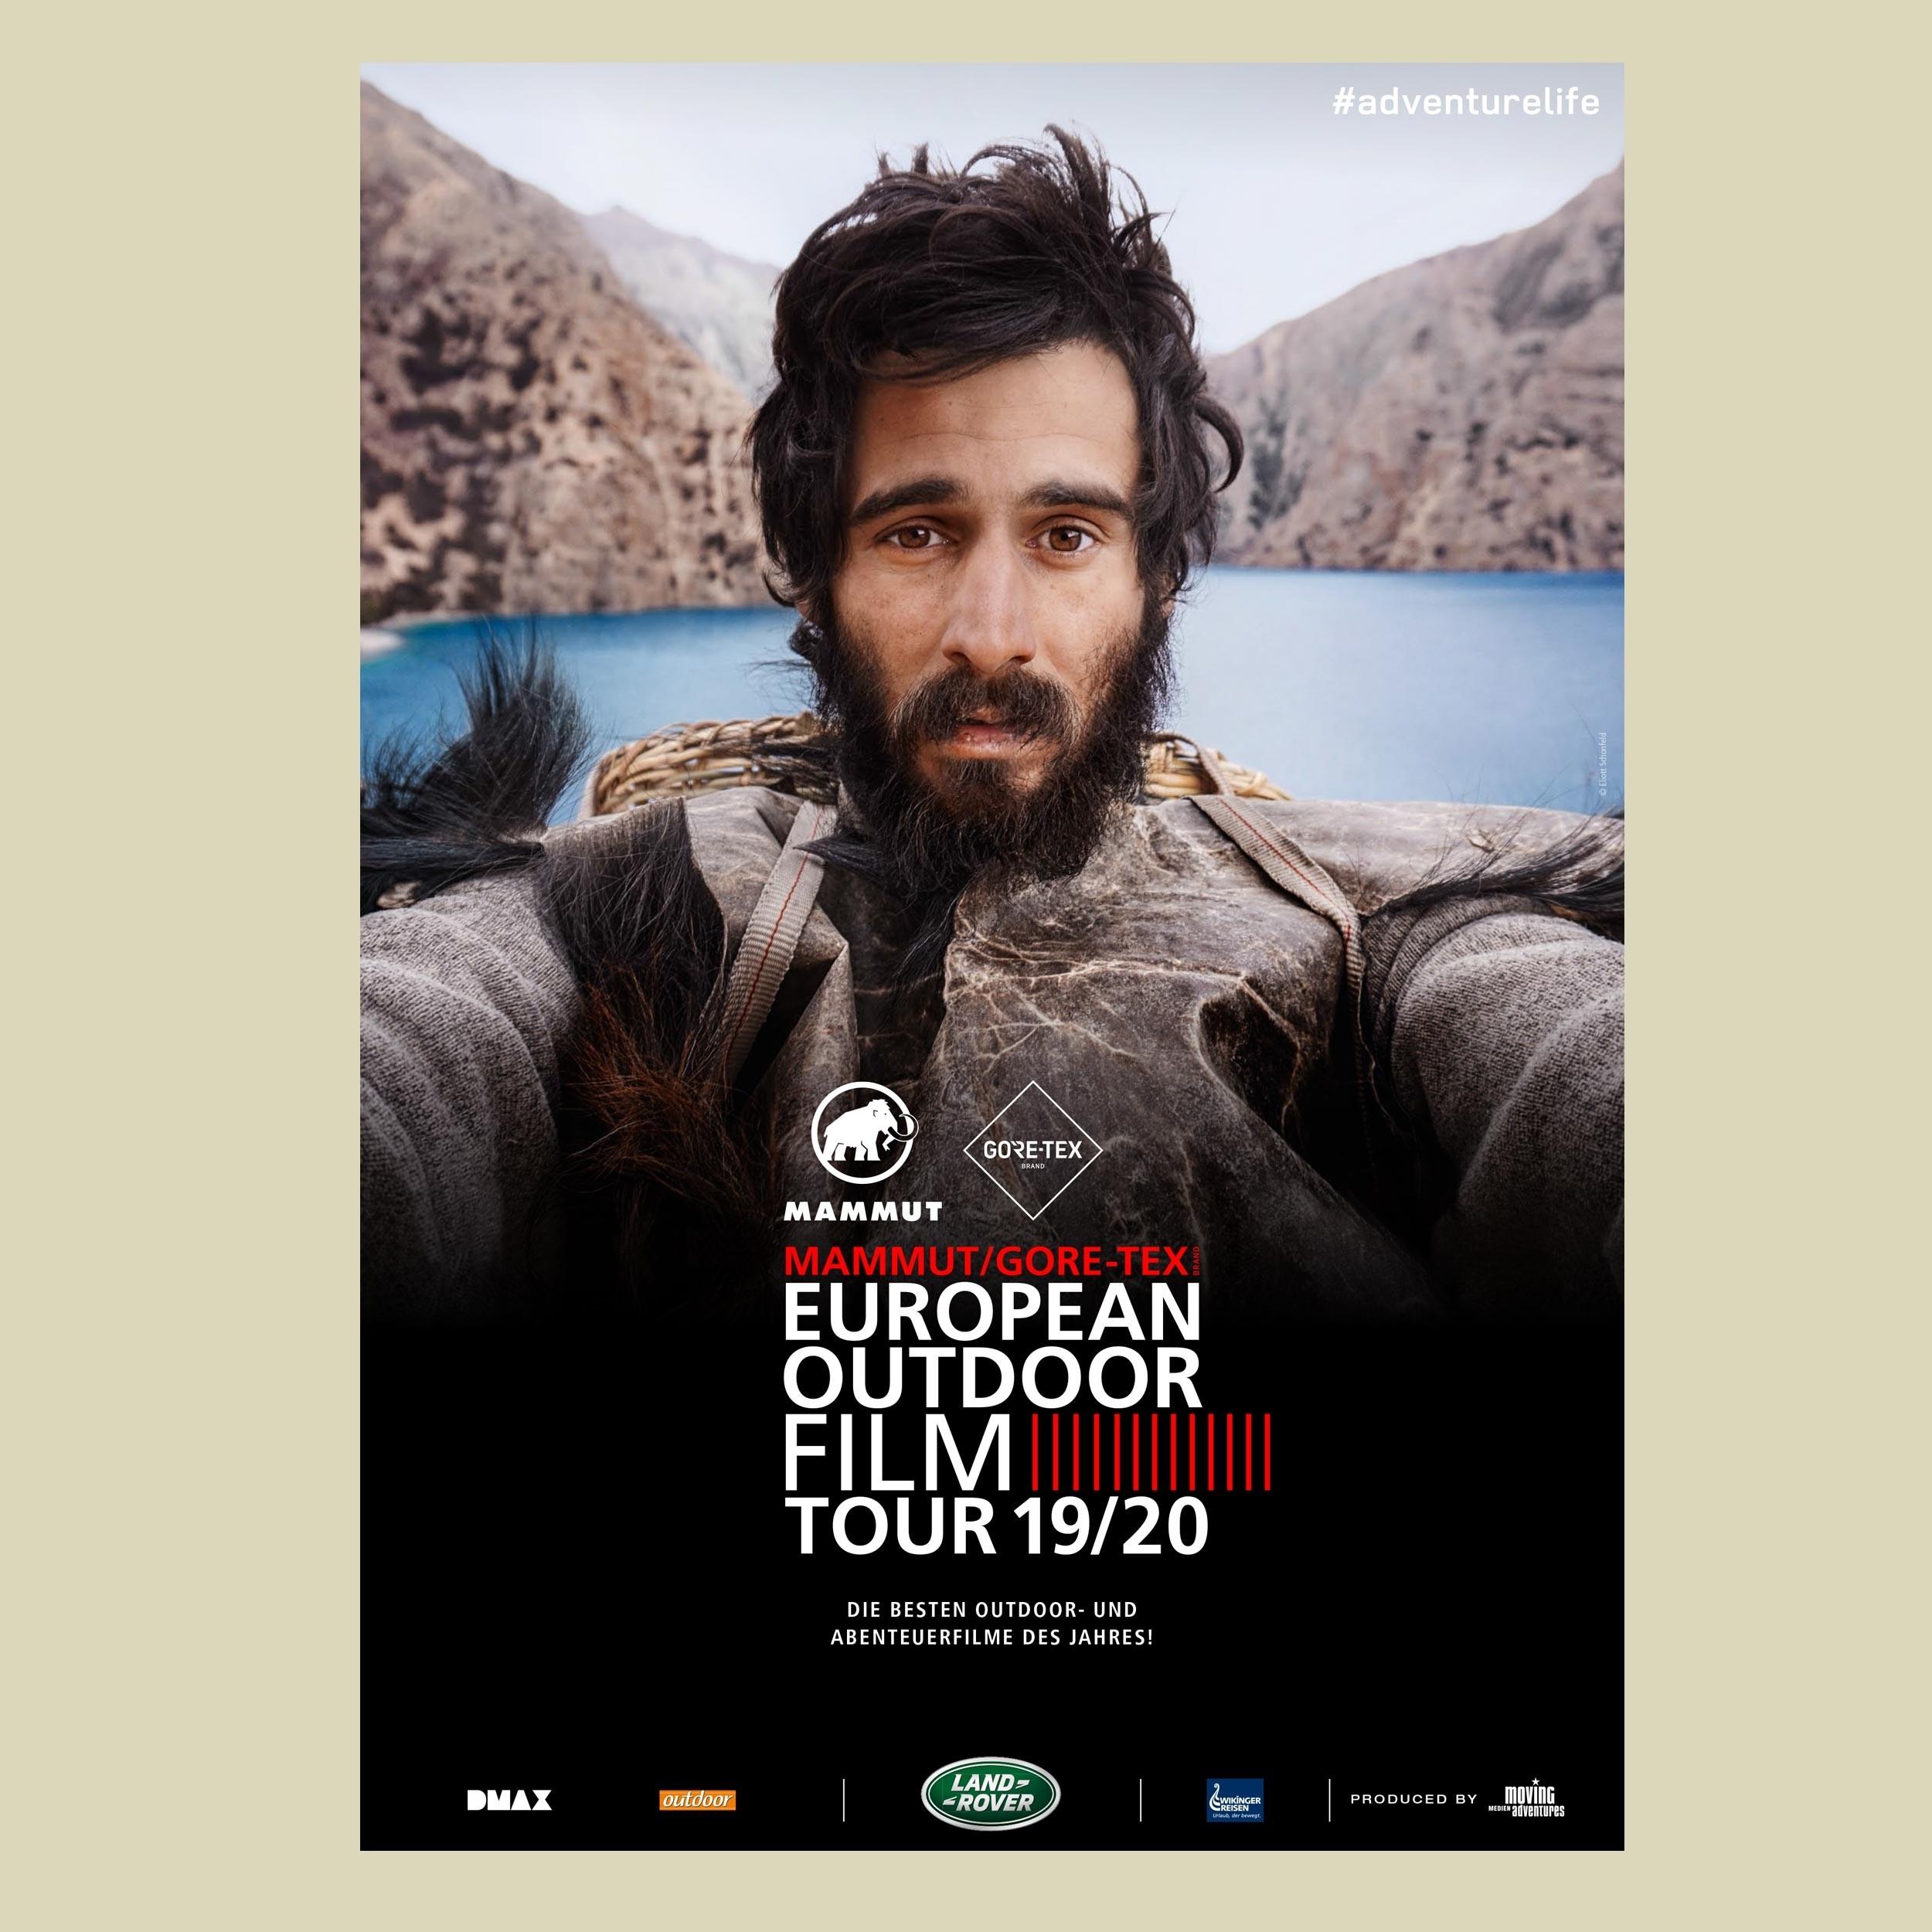 EOFT 19/20 - EUROPEAN OUTDOOR FILM Tour 19/20 - Onlineticket